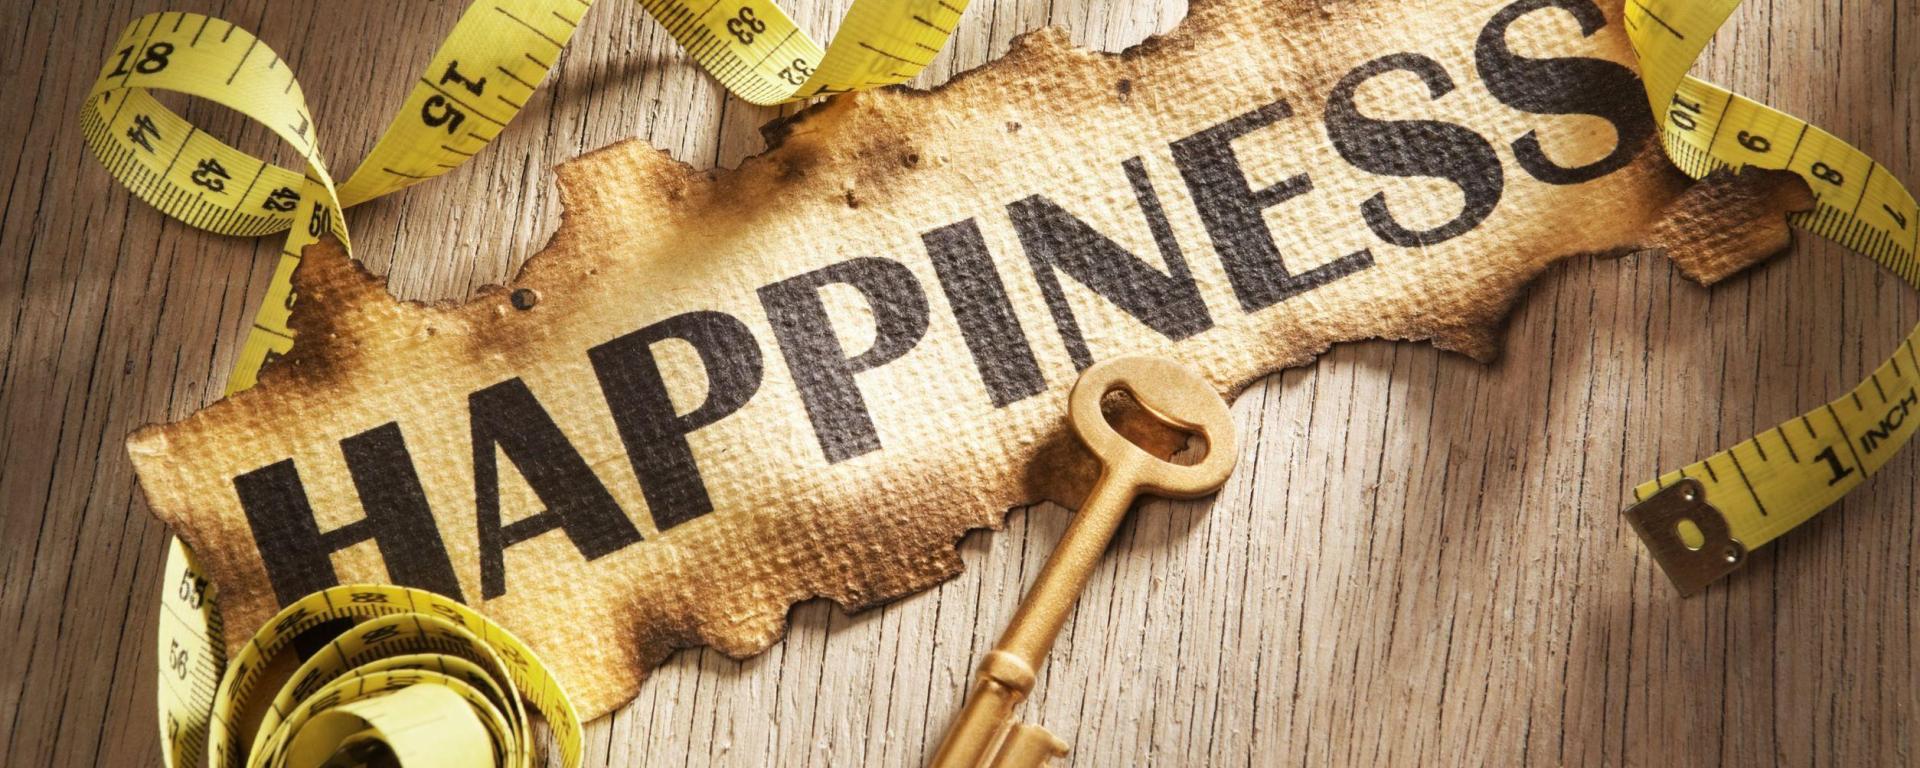 happiness, happy, ευτυχία, κλειδί, κλειδί της ευτυχίας